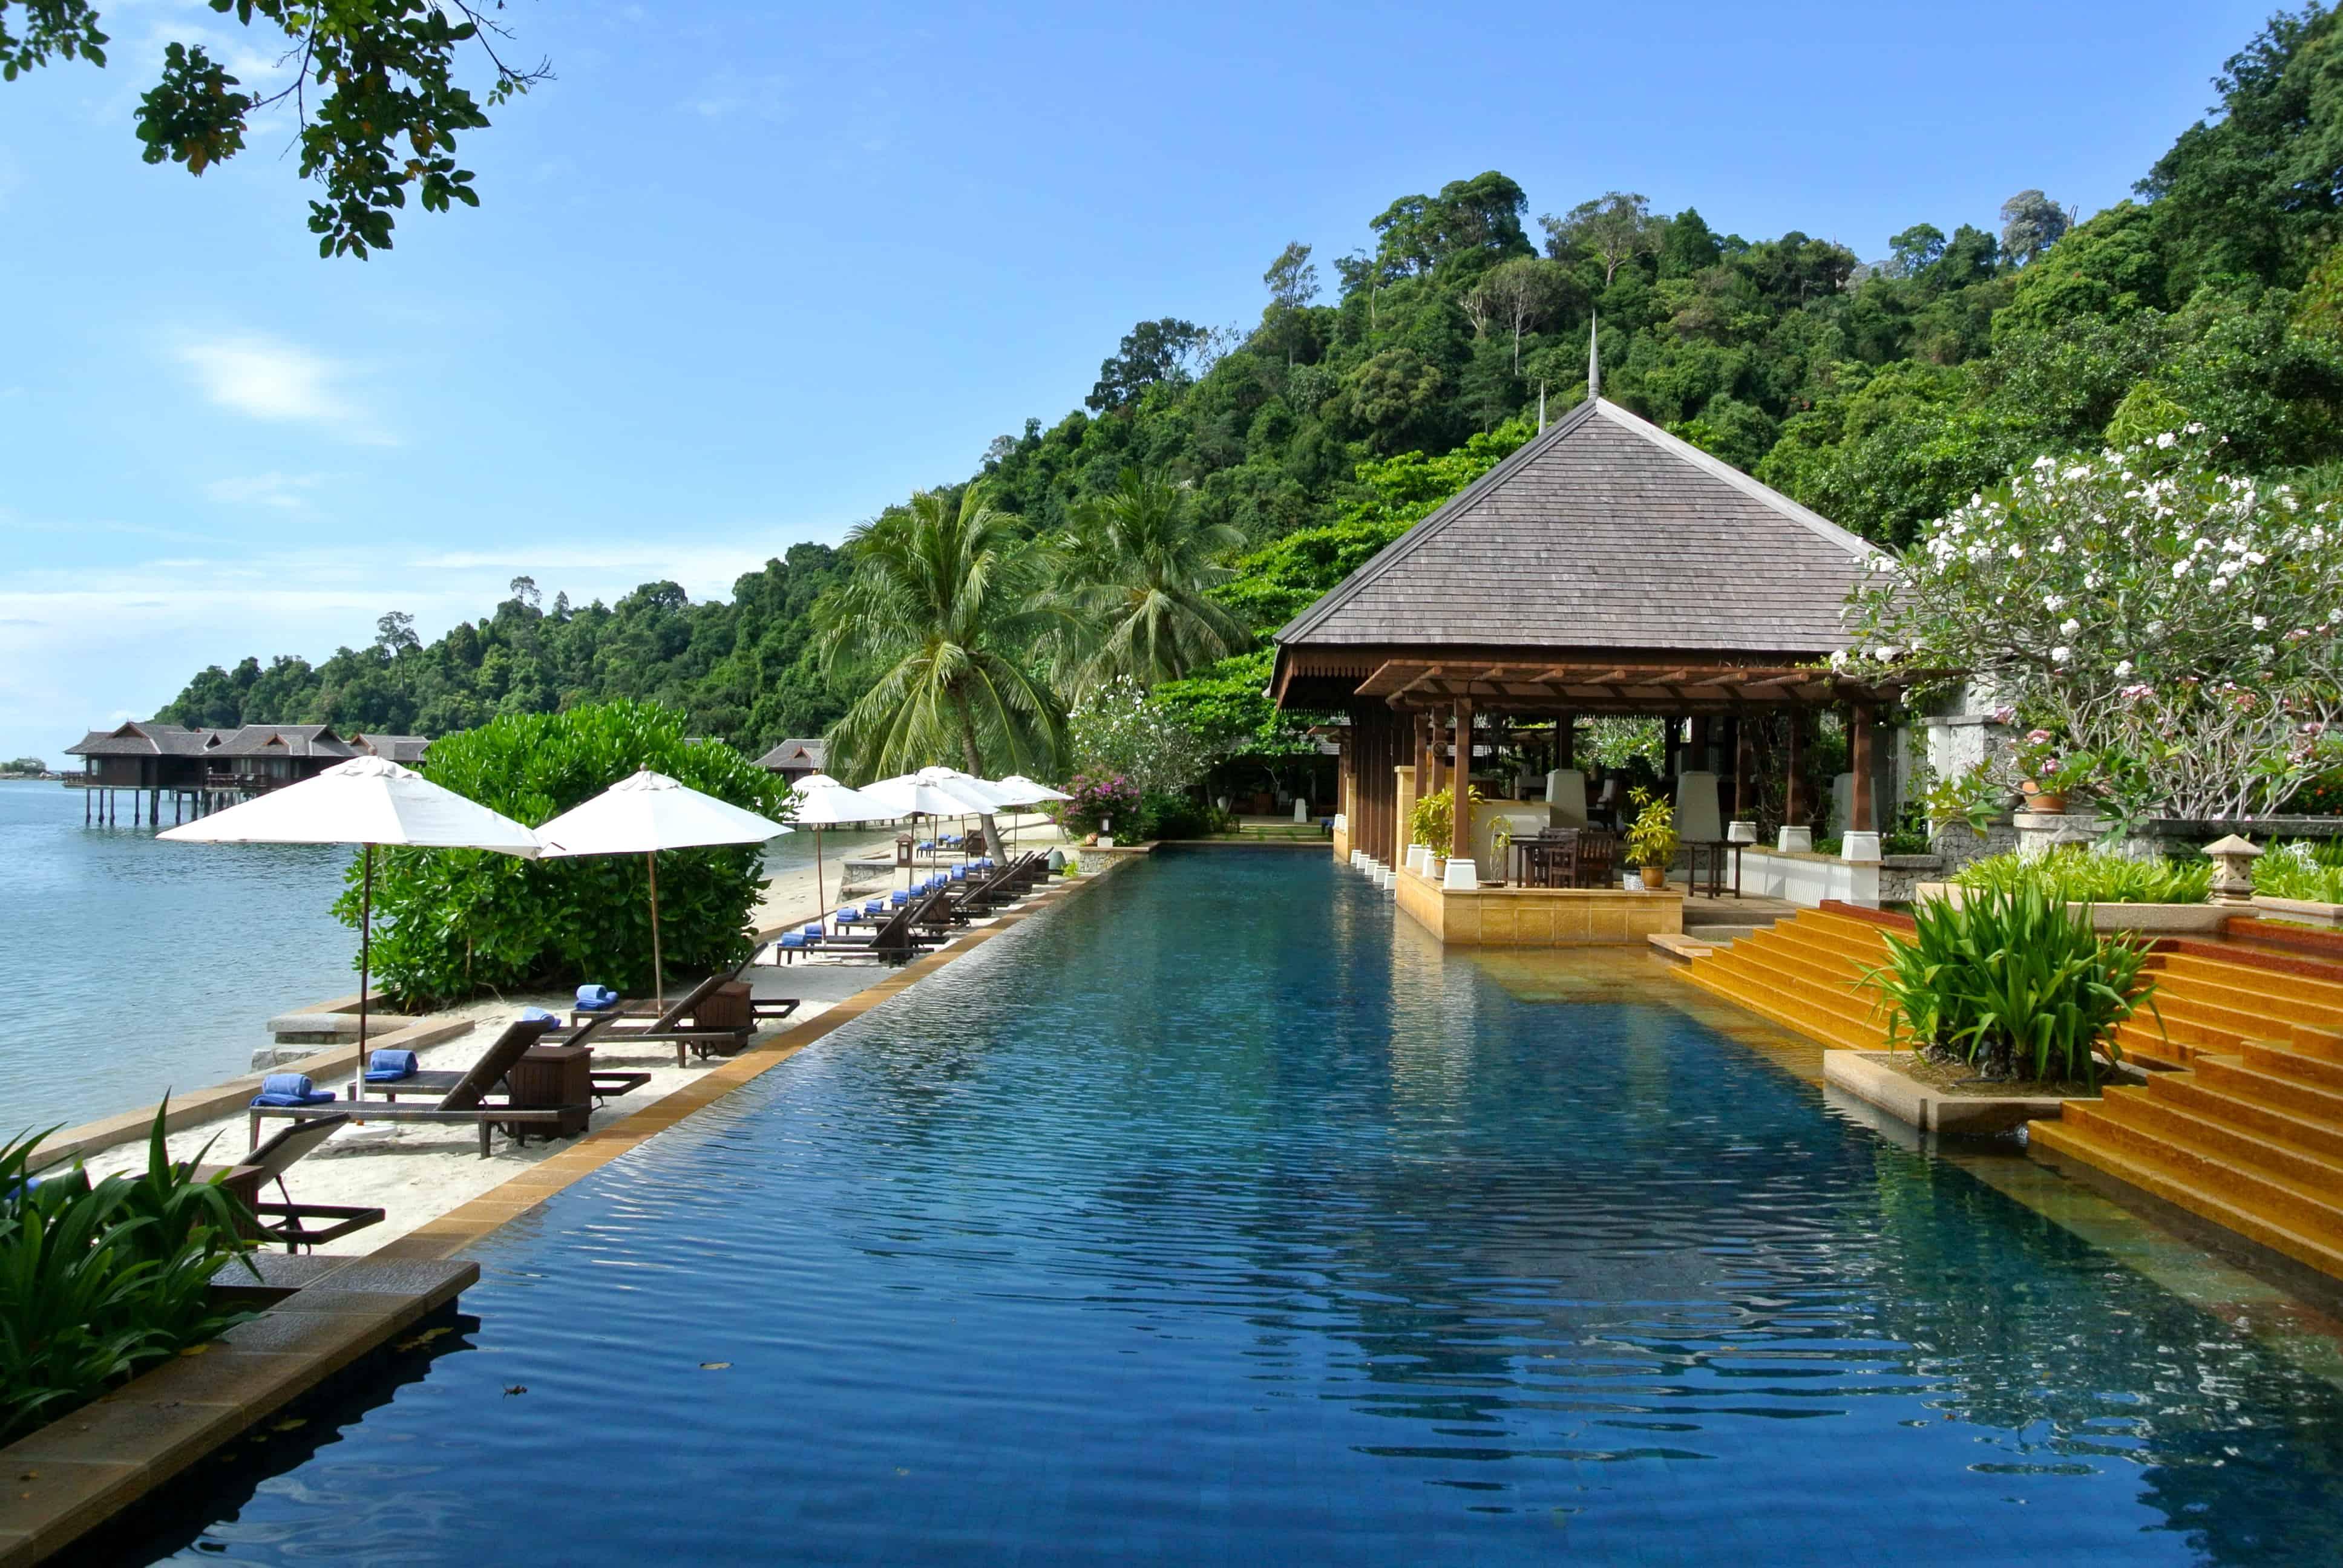 PangkorLaut Resort - Best Picturesque Wedding Destinations in Asia